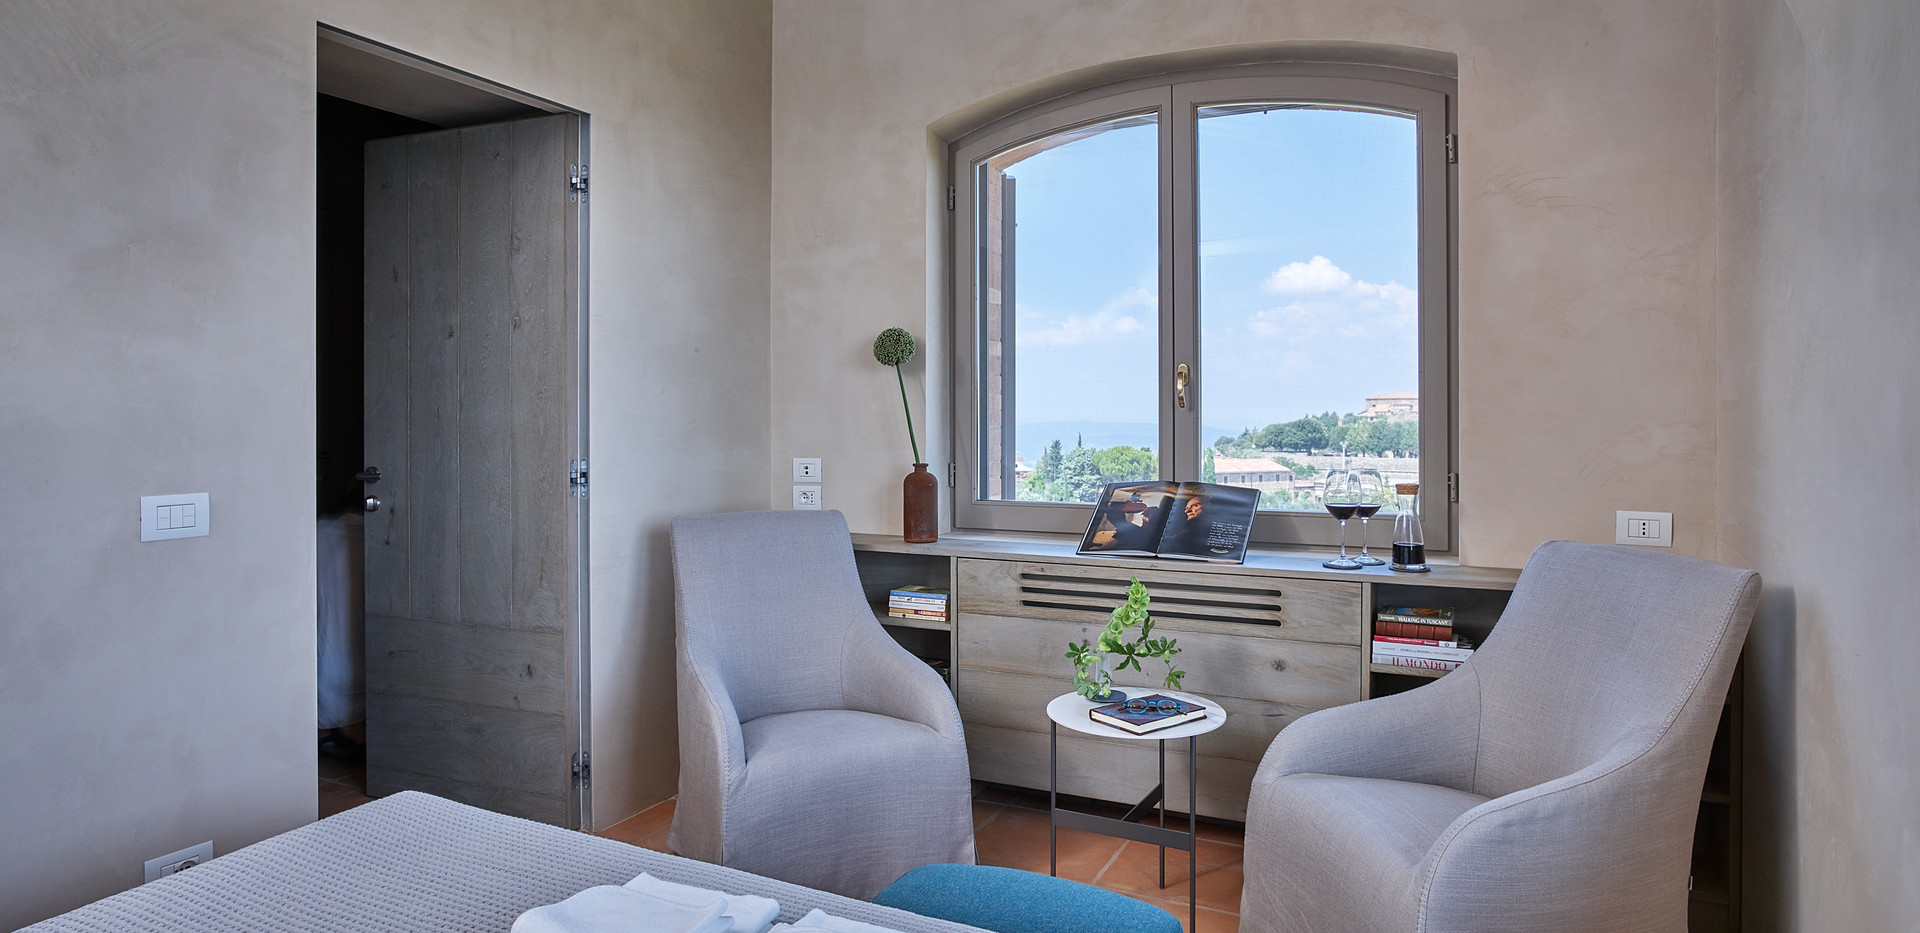 Villa Palazzetta-Aug 2018-0380.jpg